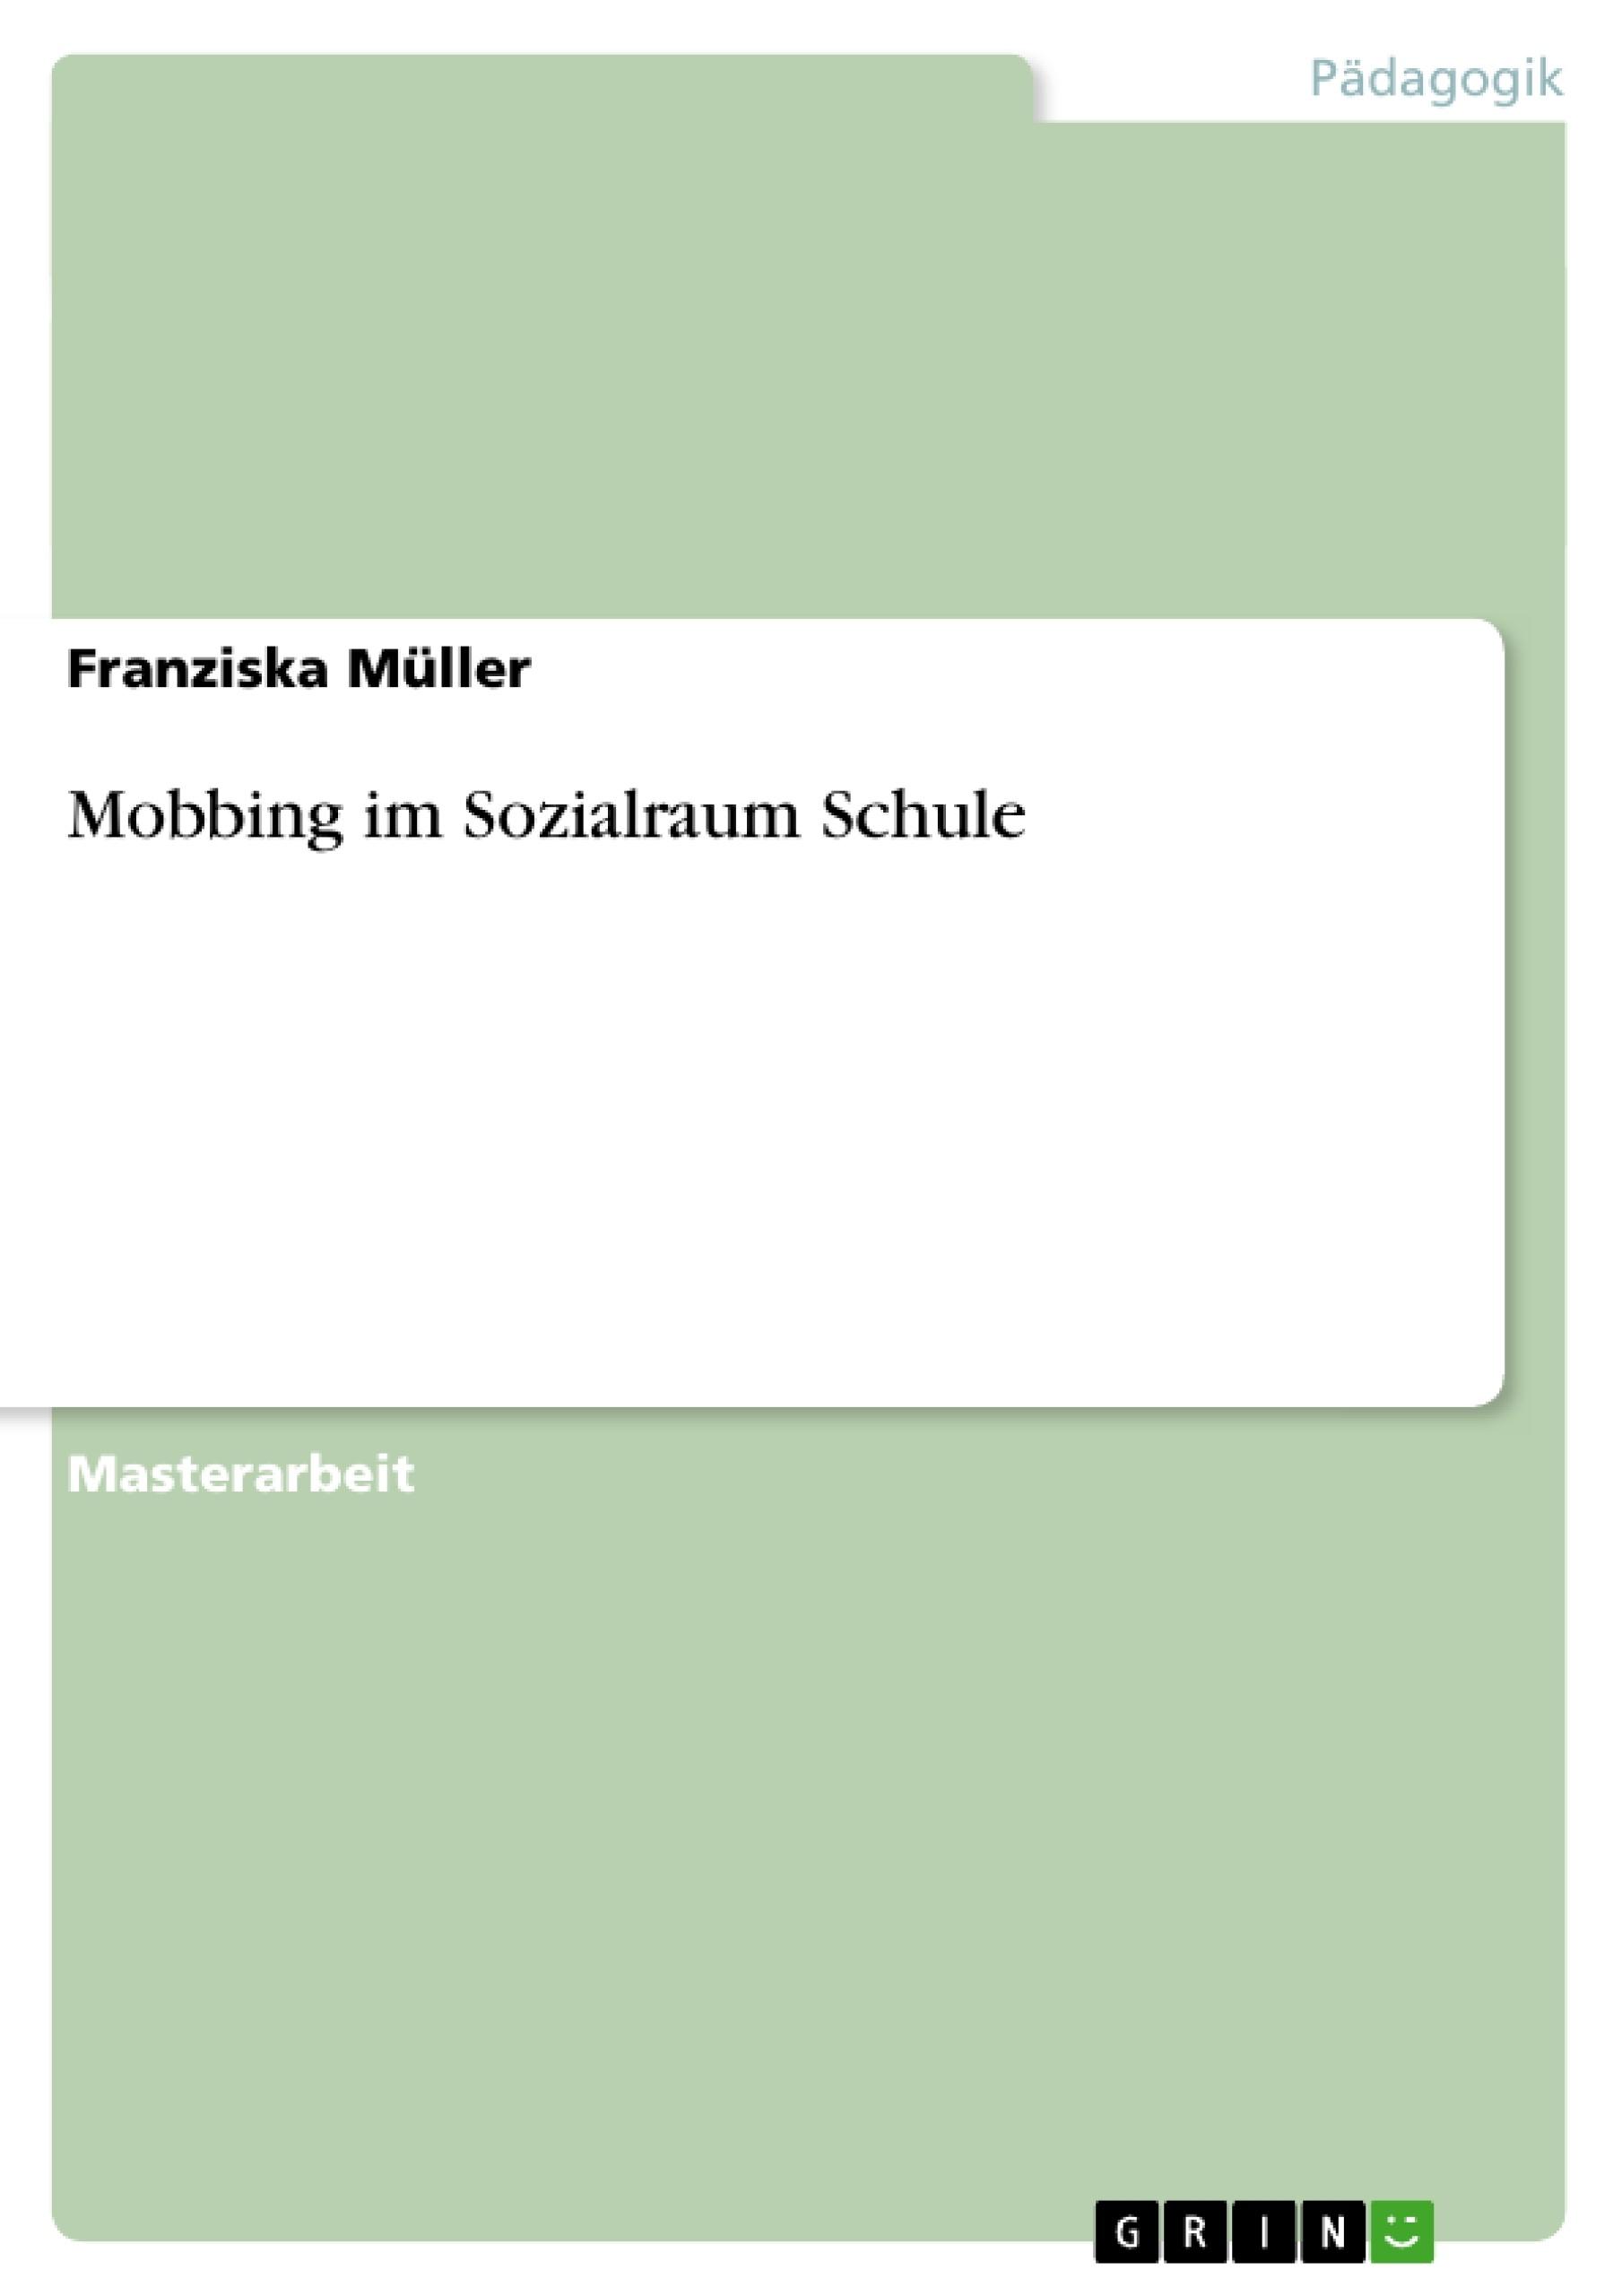 Titel: Mobbing im Sozialraum Schule